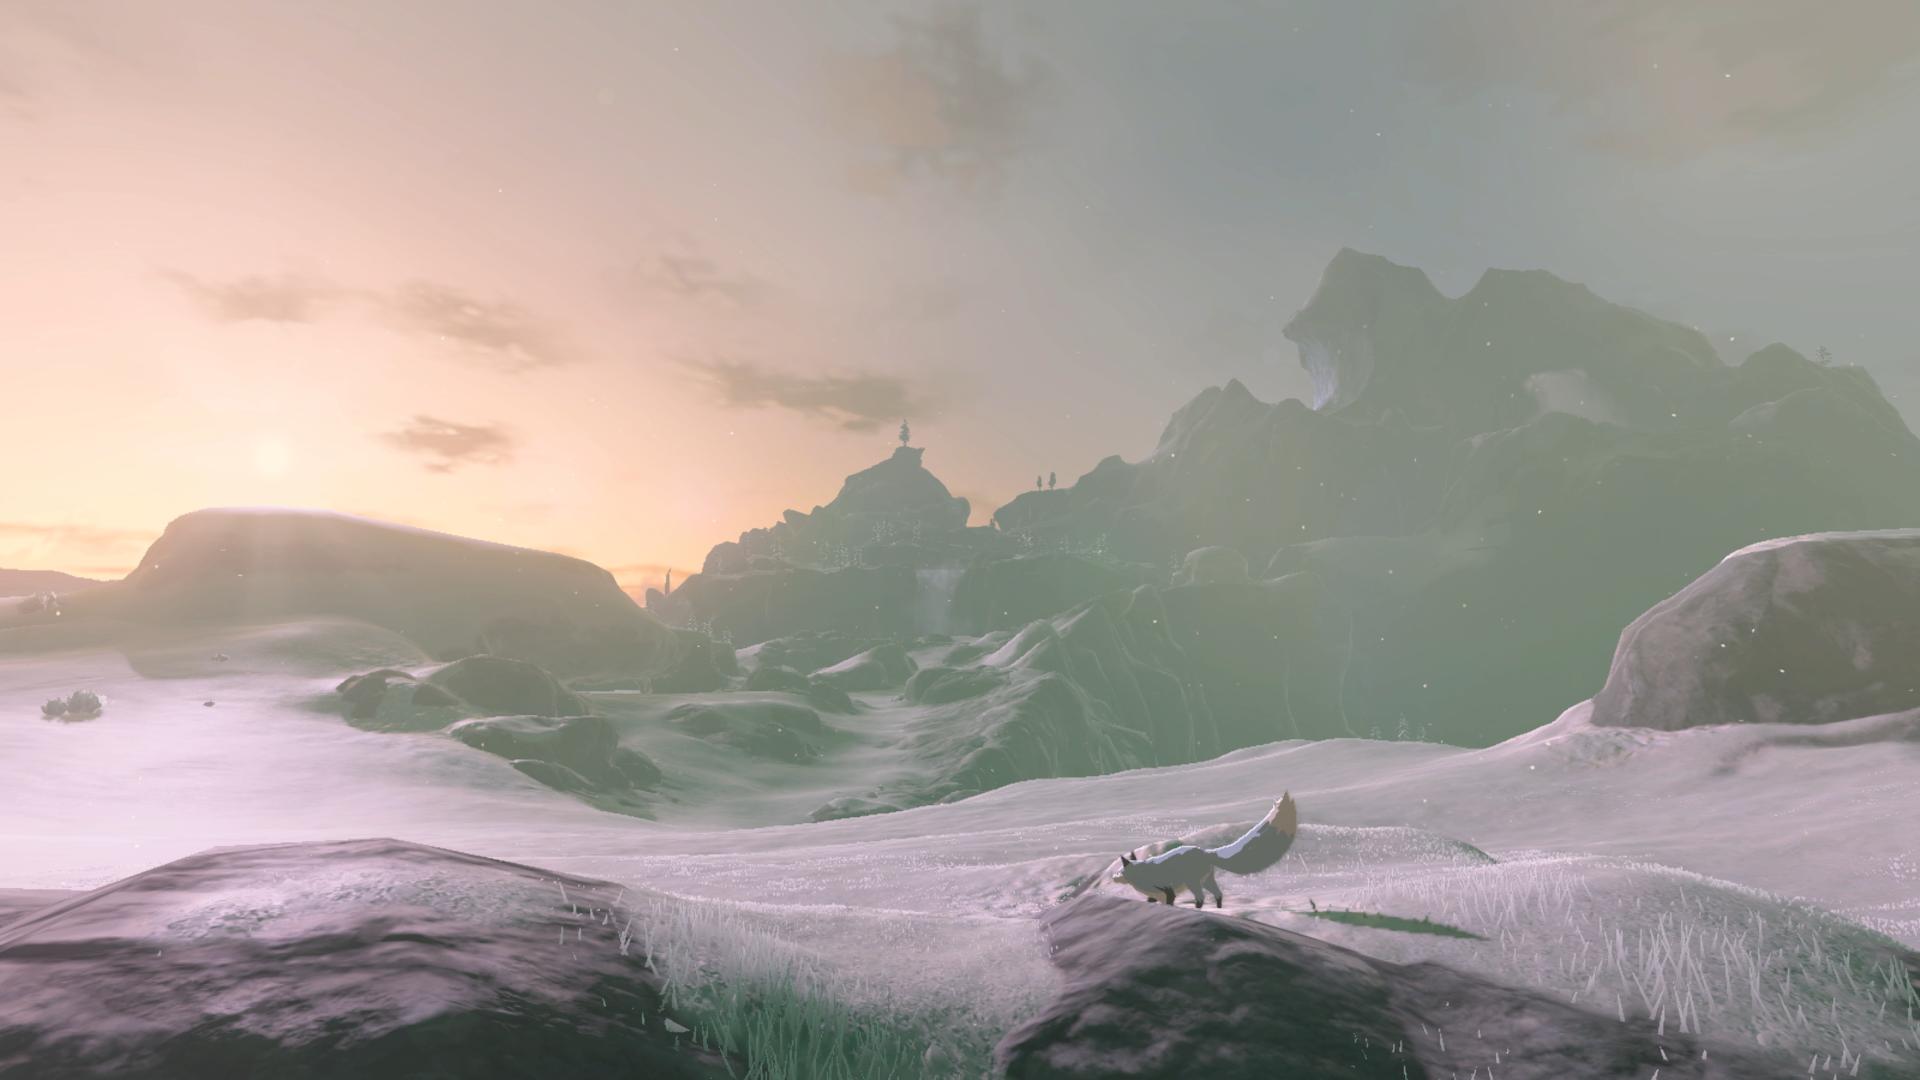 The Legend of Zelda: Breath of the Wild image 18